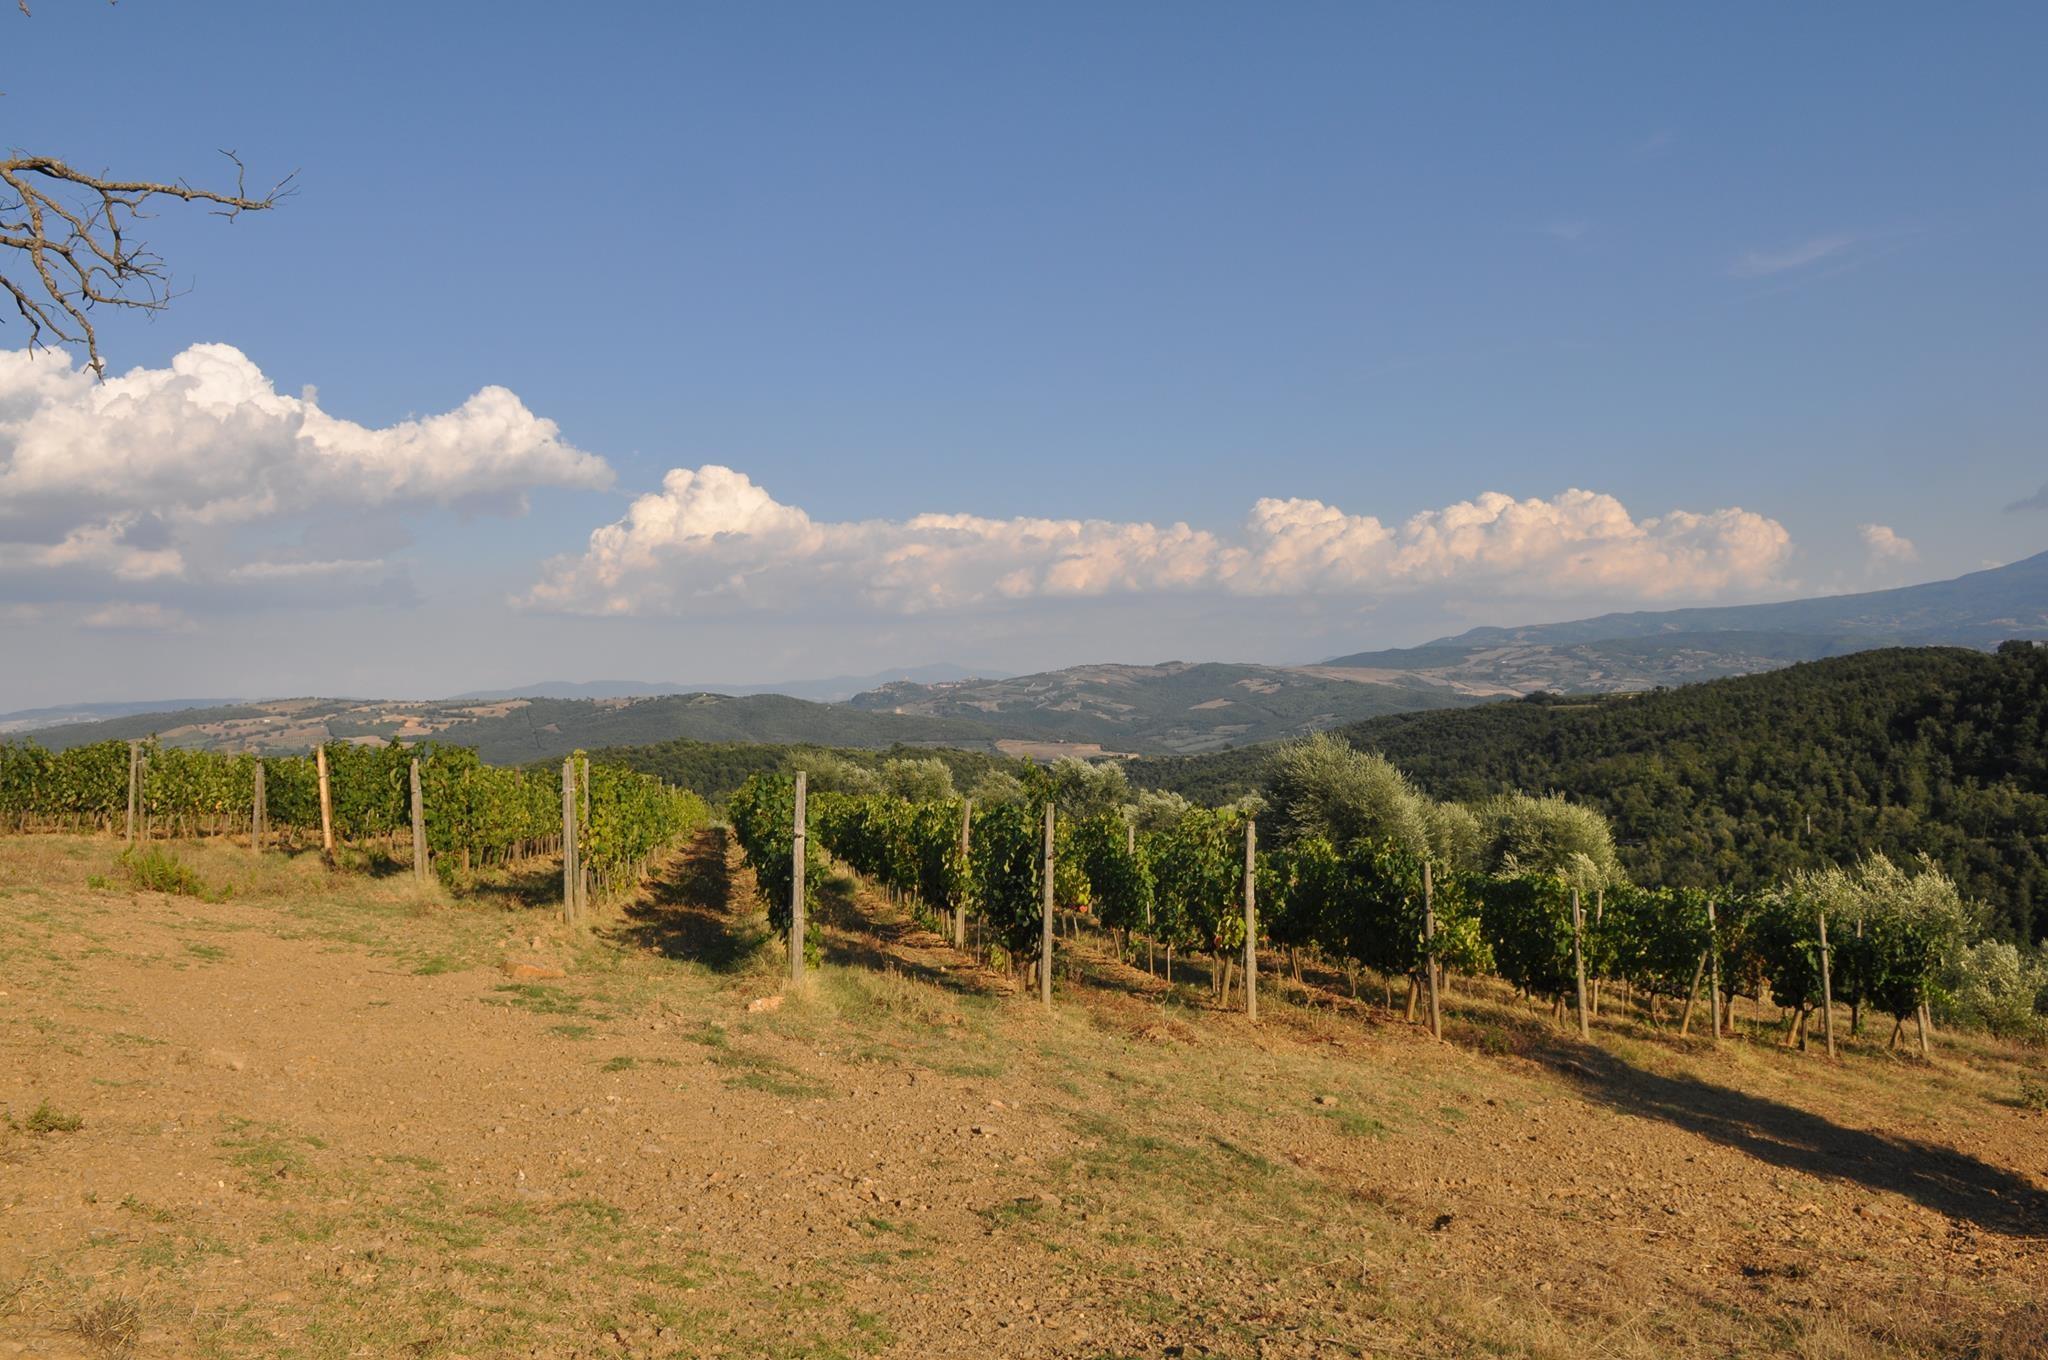 Scopone - Montalcino (Tuscany) //  Wine Map of Italy>  //  Wine Map of Tuscany>